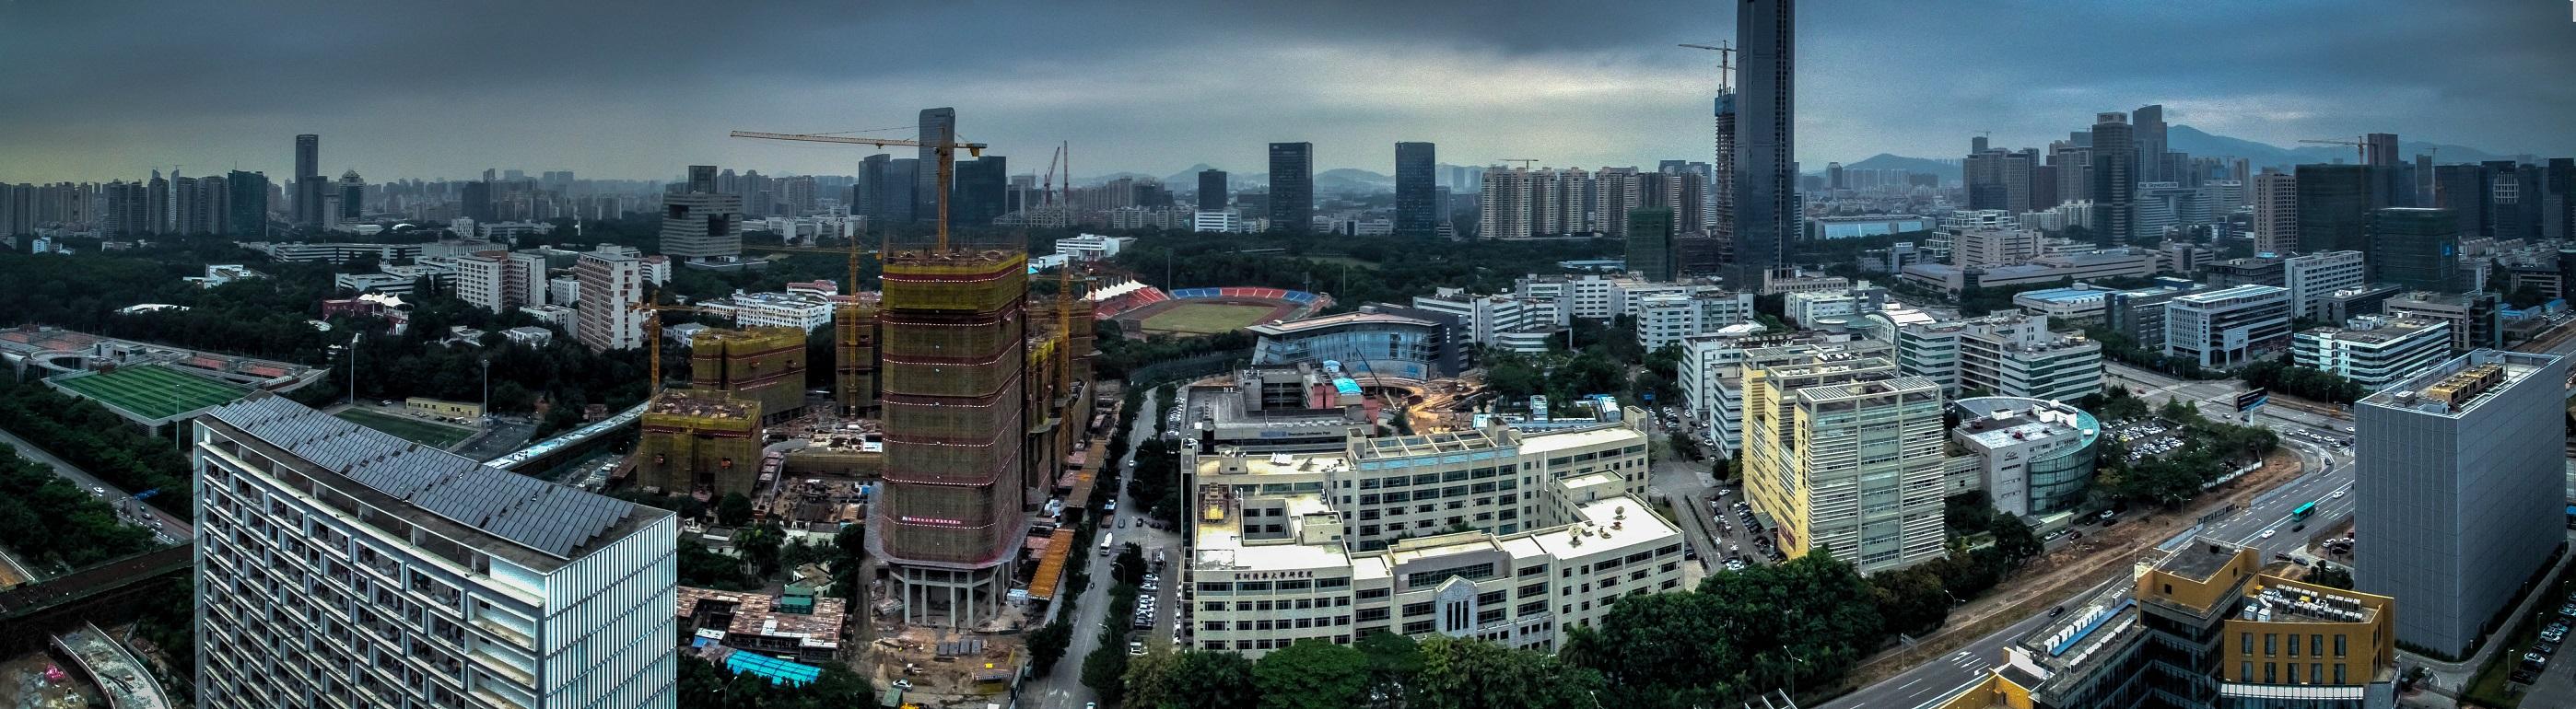 20151222-Untitled_Panorama1.jpg